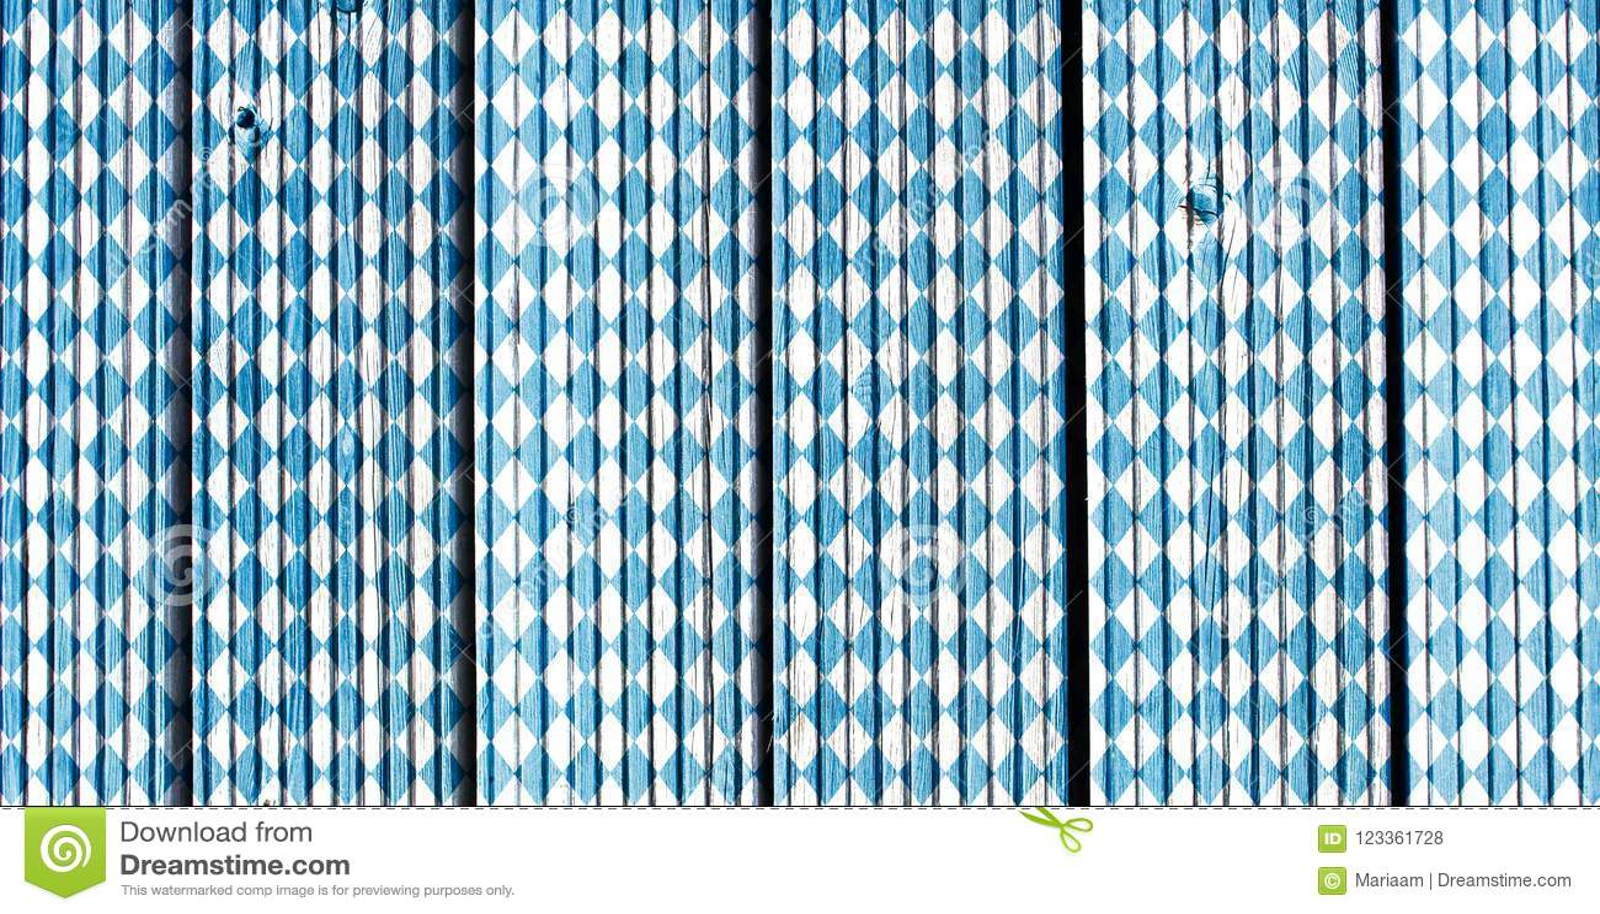 Bavarian flag pattern. Traditional texture. Oktoberfest background.